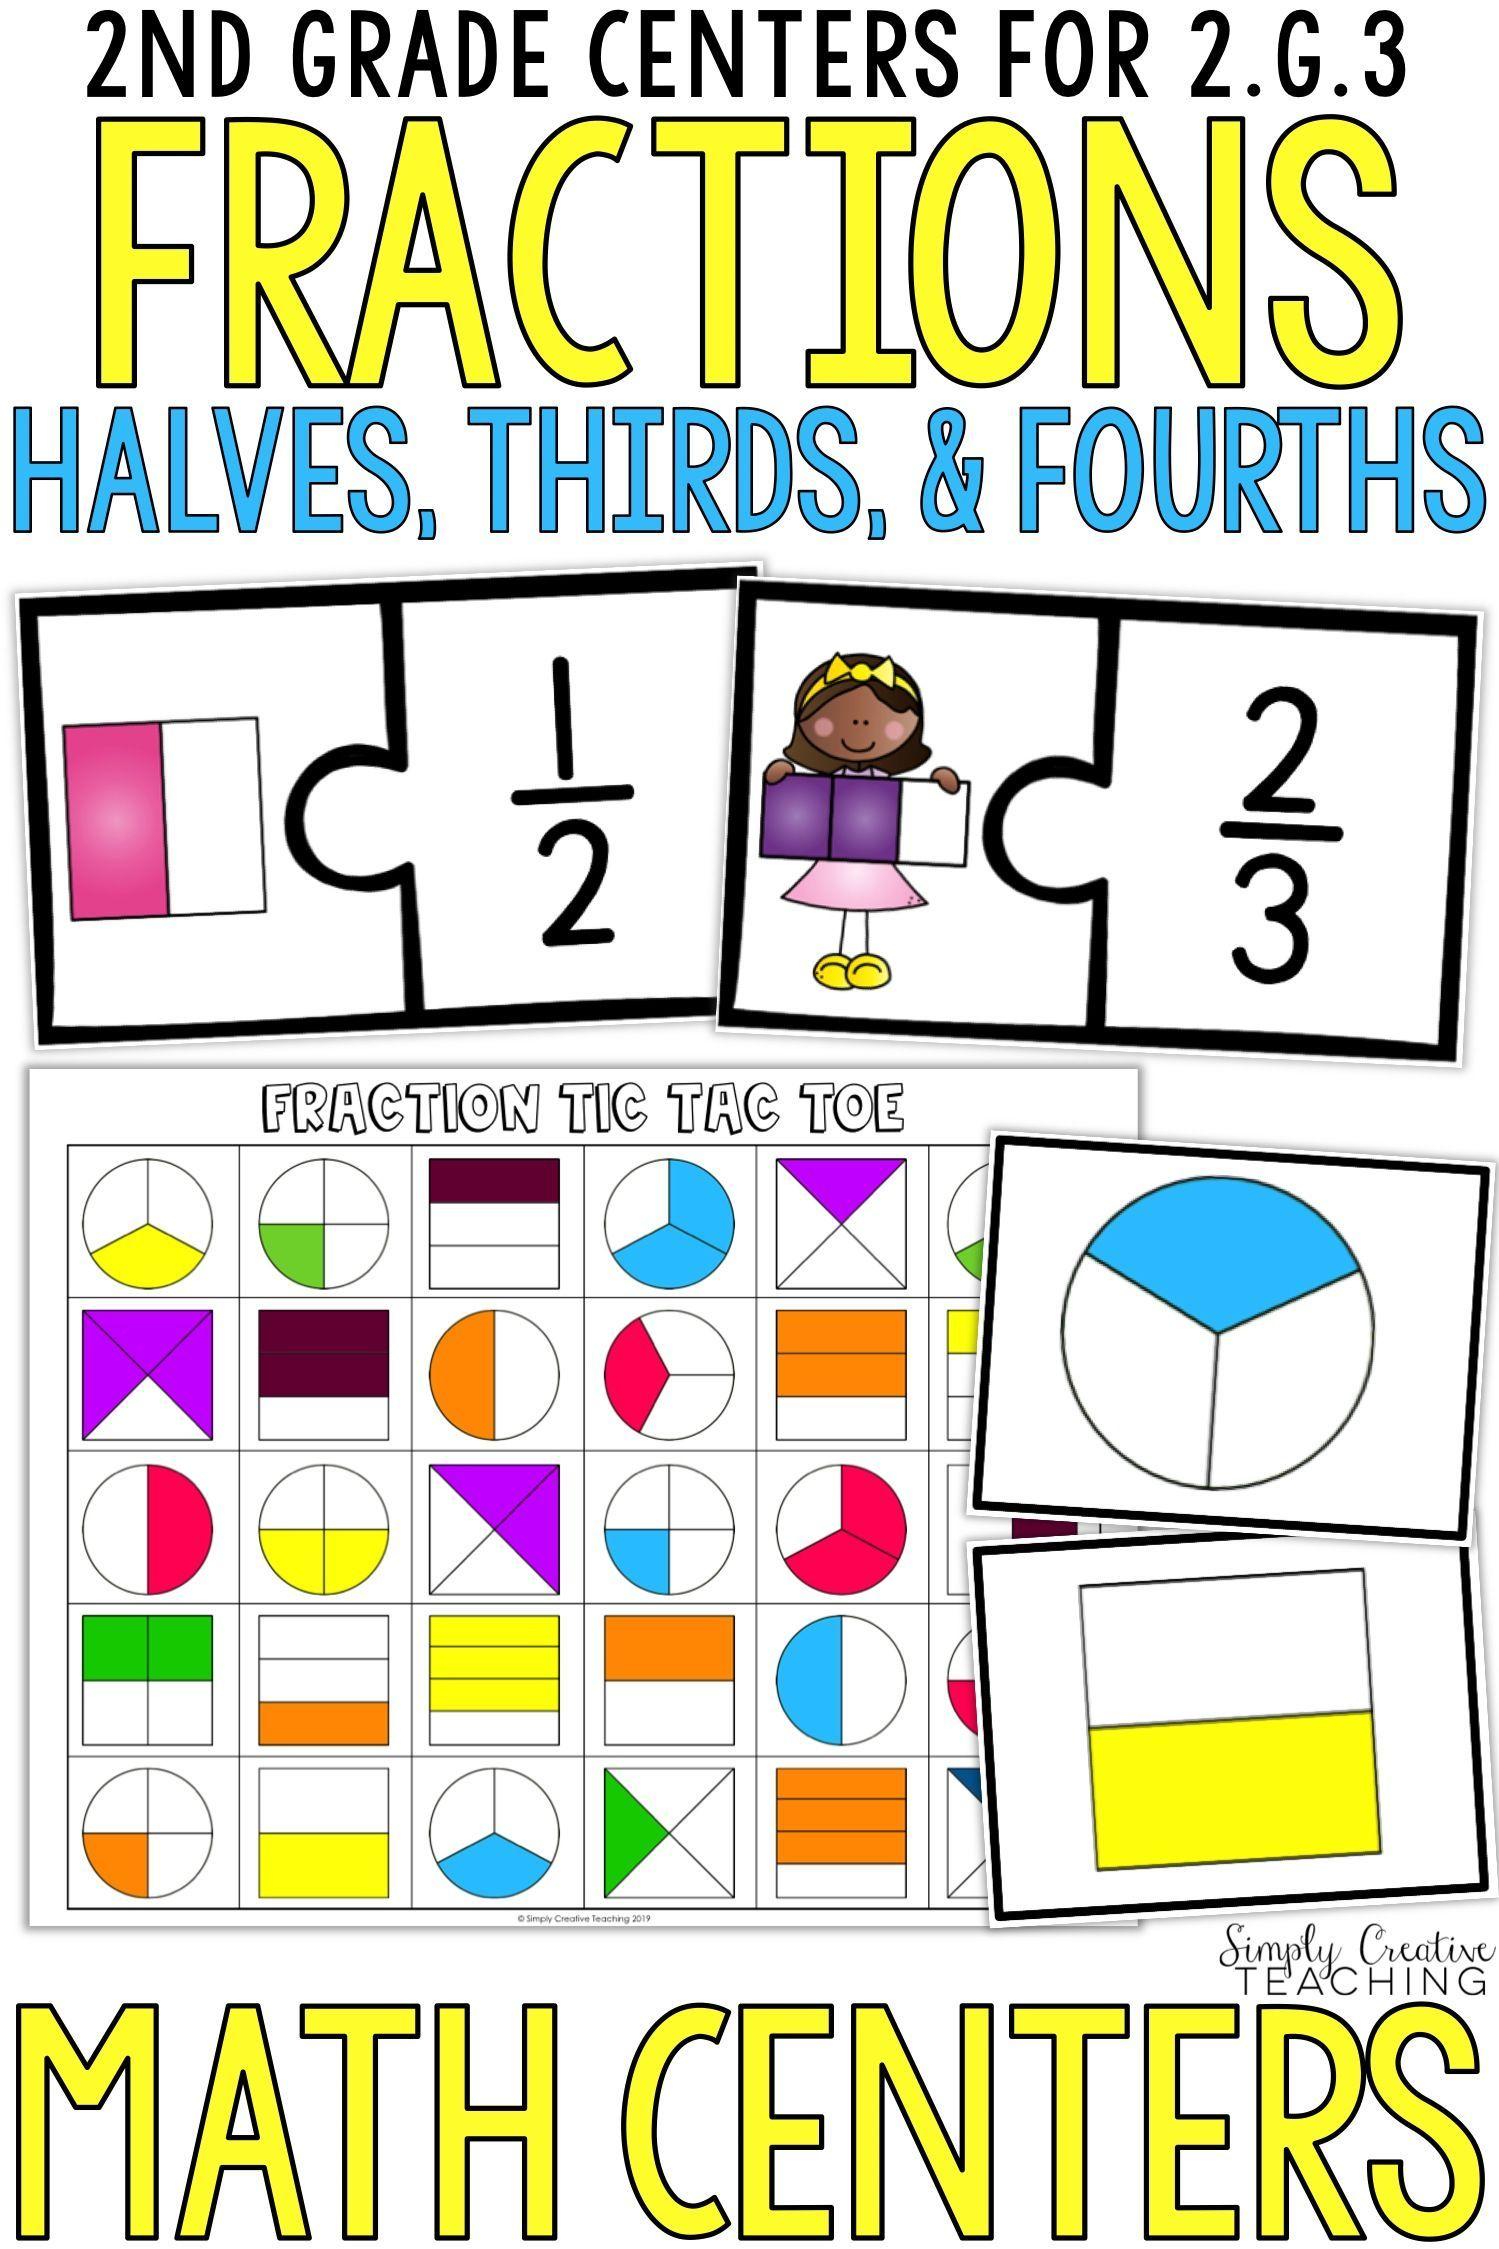 medium resolution of 2nd Grade Partitioning Shapes into Halves